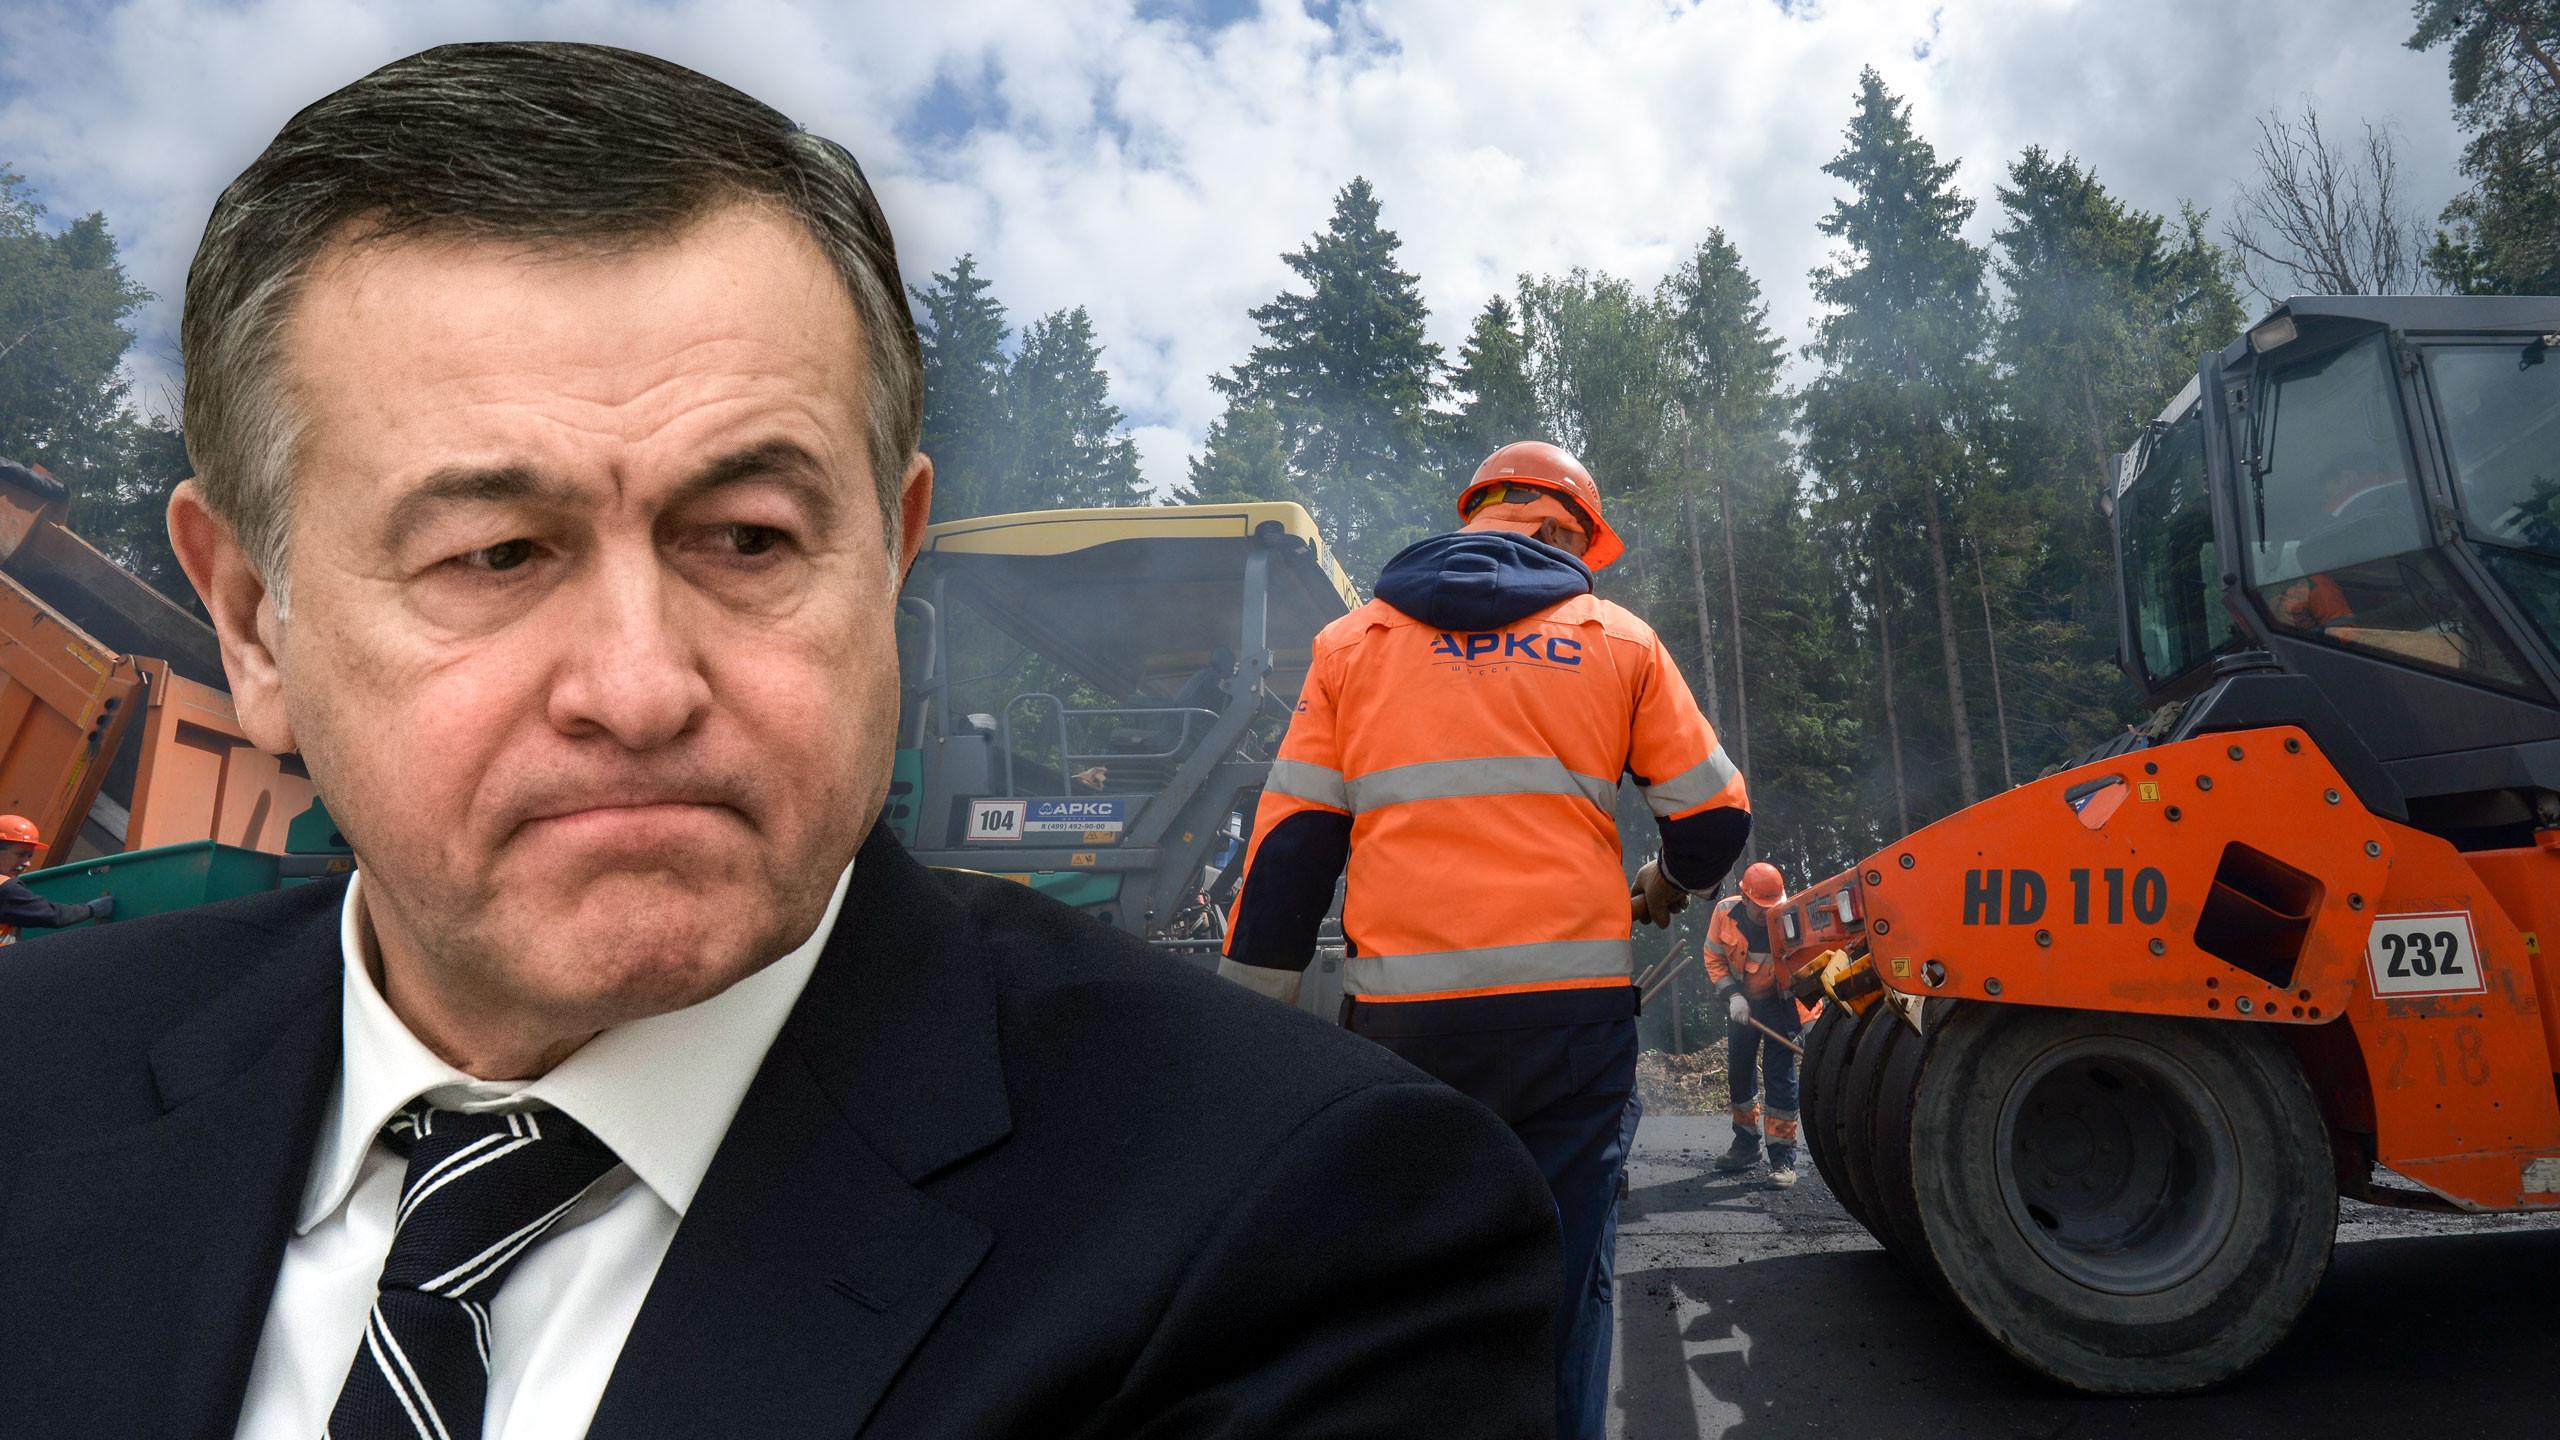 <p>Фото: &copy; РИА Новости/Сергей Гунеев, Евгений Одиноков</p>